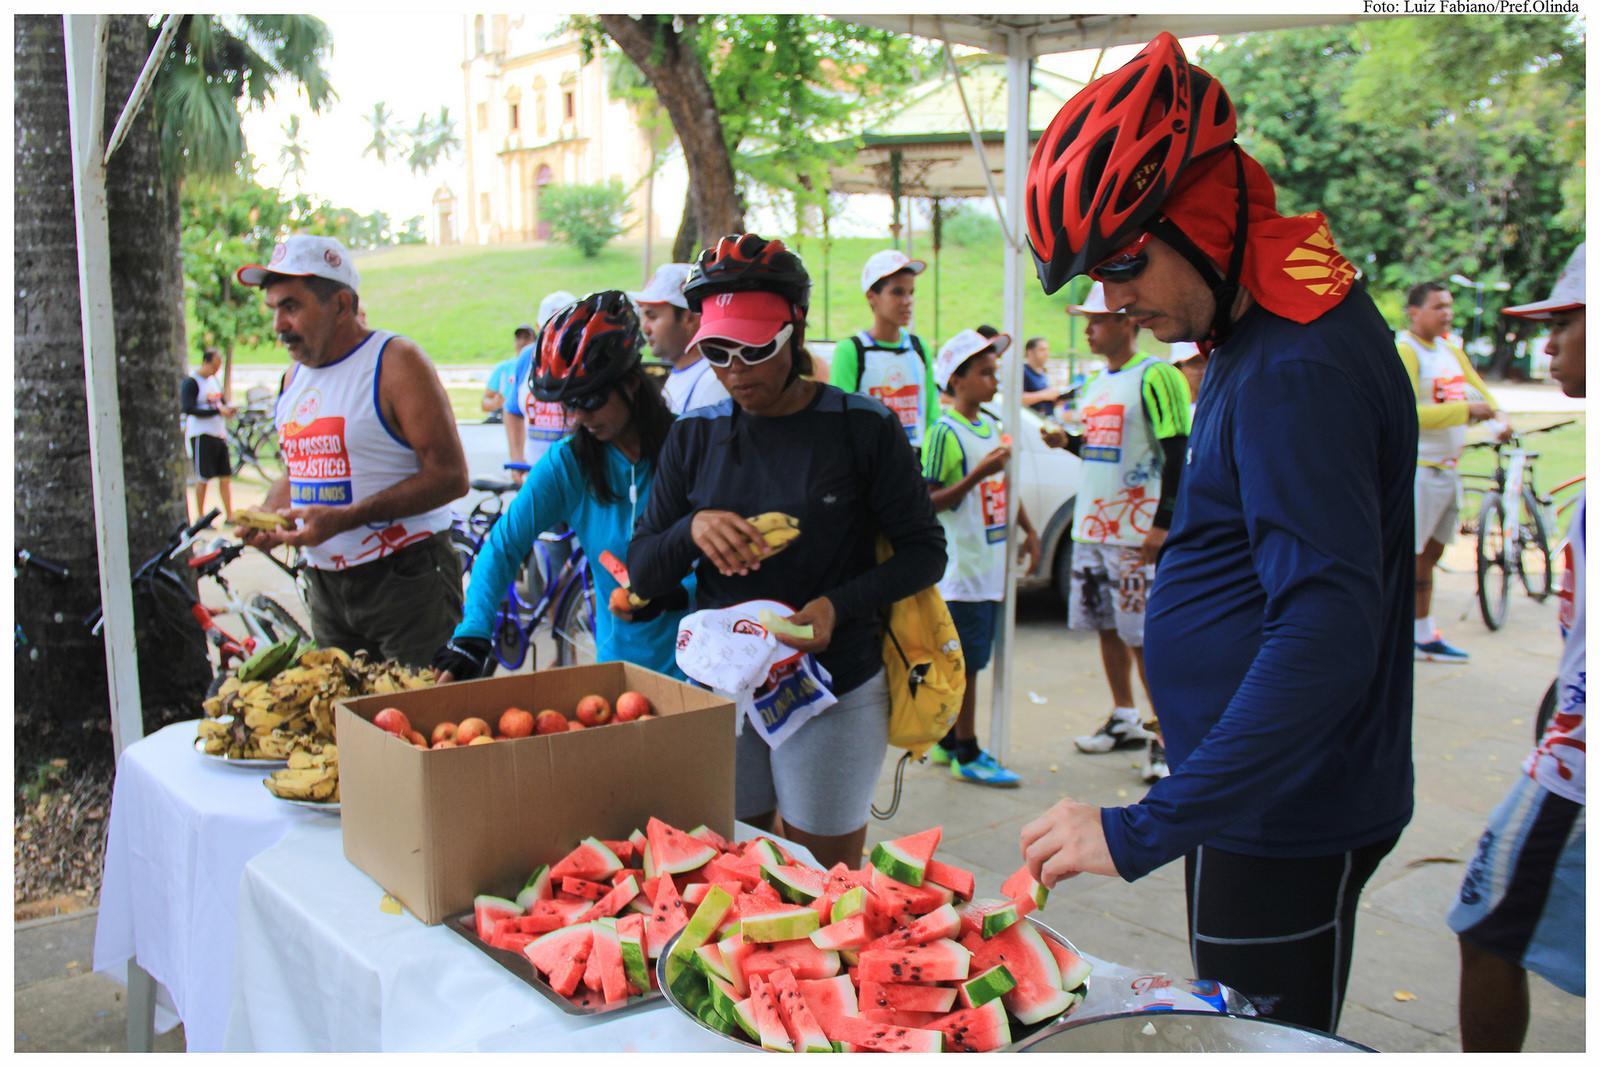 2º Passeio Ciclístico - Olinda 481 anos. Foto: Luiz Fabiano/Pref.Olinda